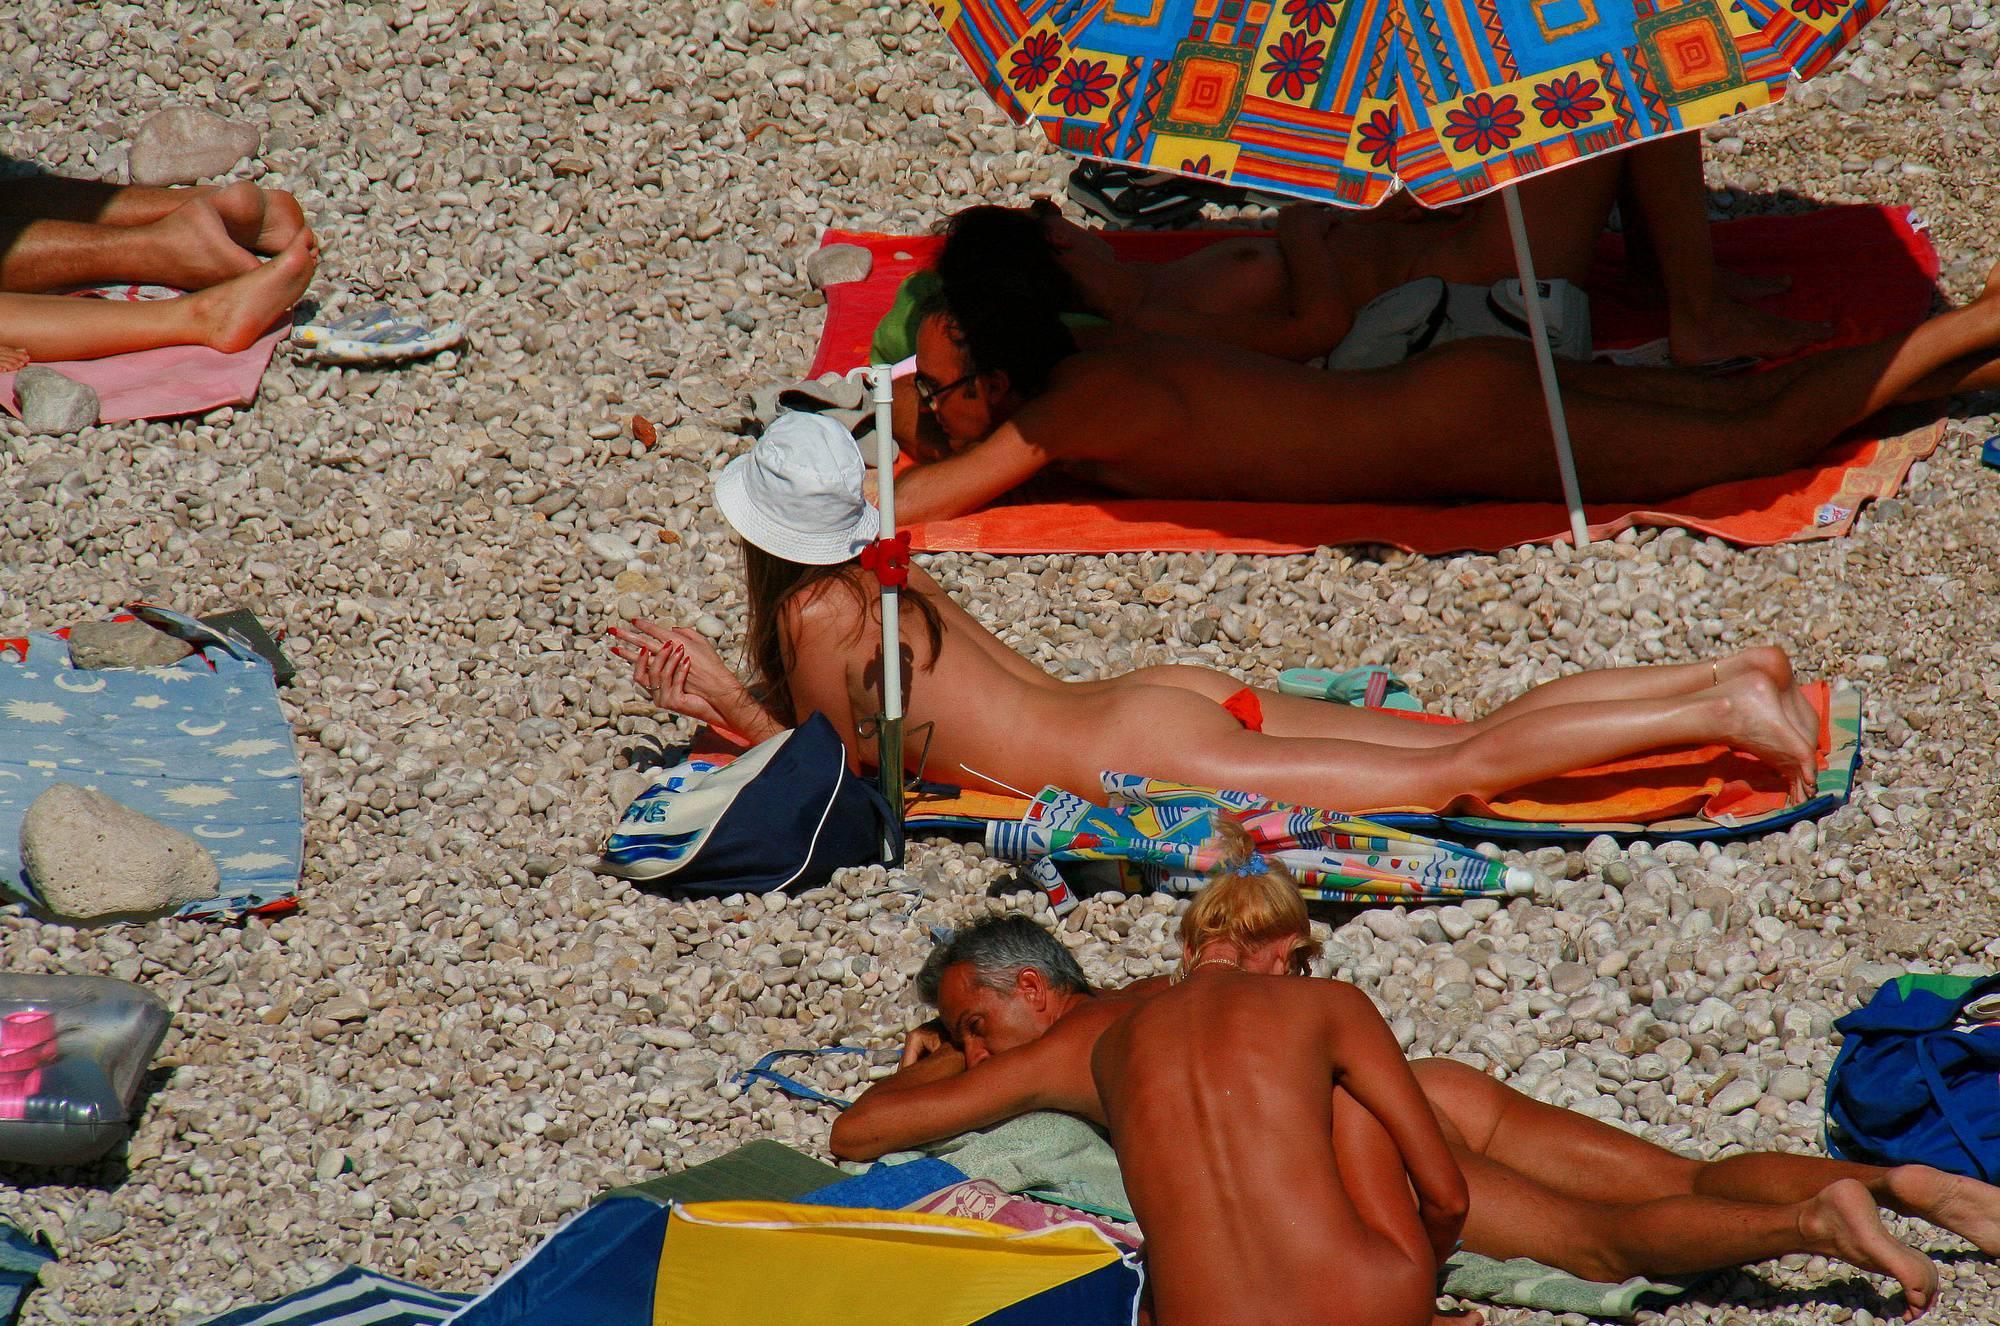 Nudist Pics Ula FKK Beach Camping - 2